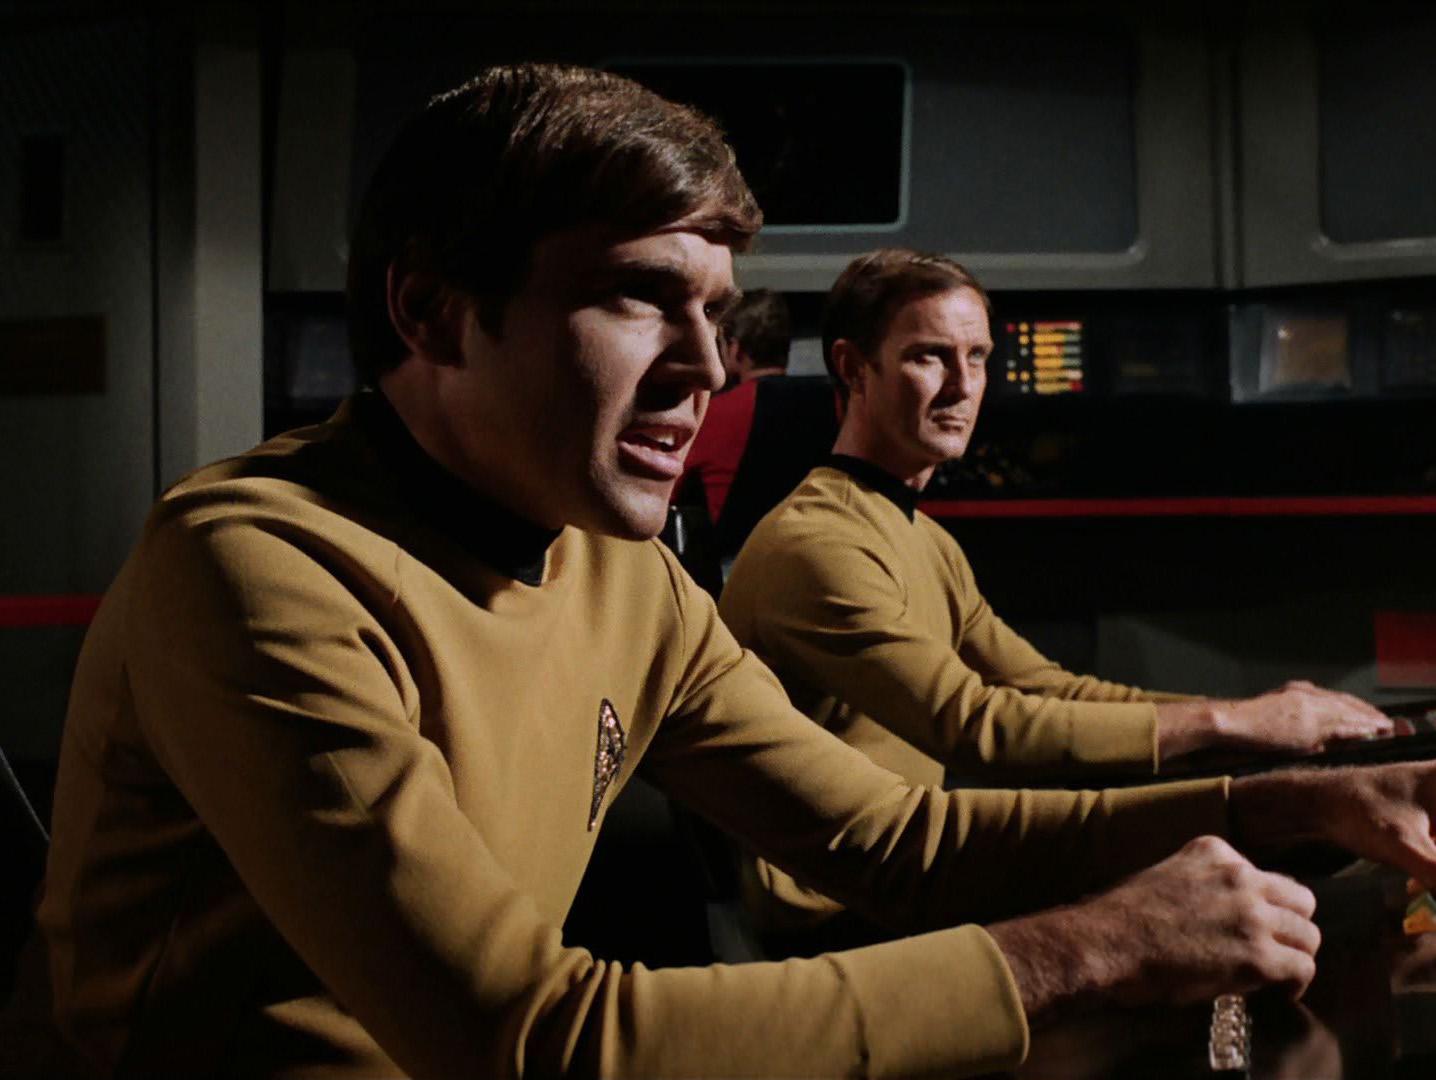 Hollywood to celebrate Star Trek's Chekov with star on Walk of